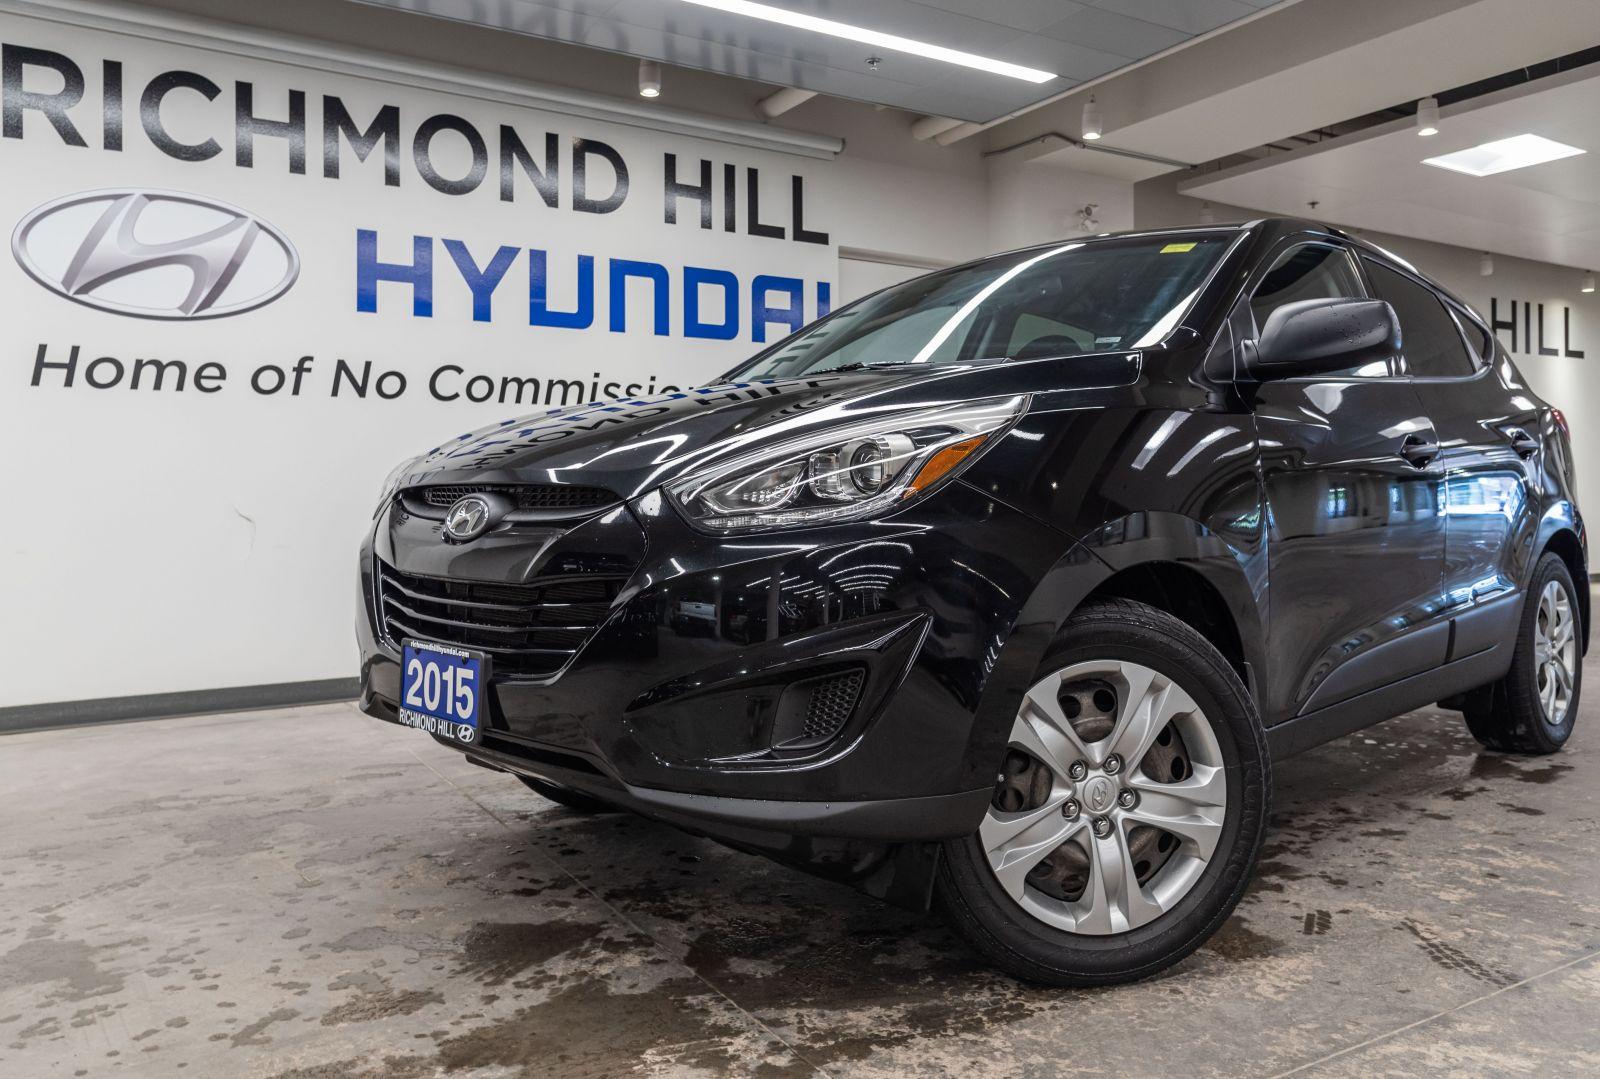 2015 Hyundai Tucson Image